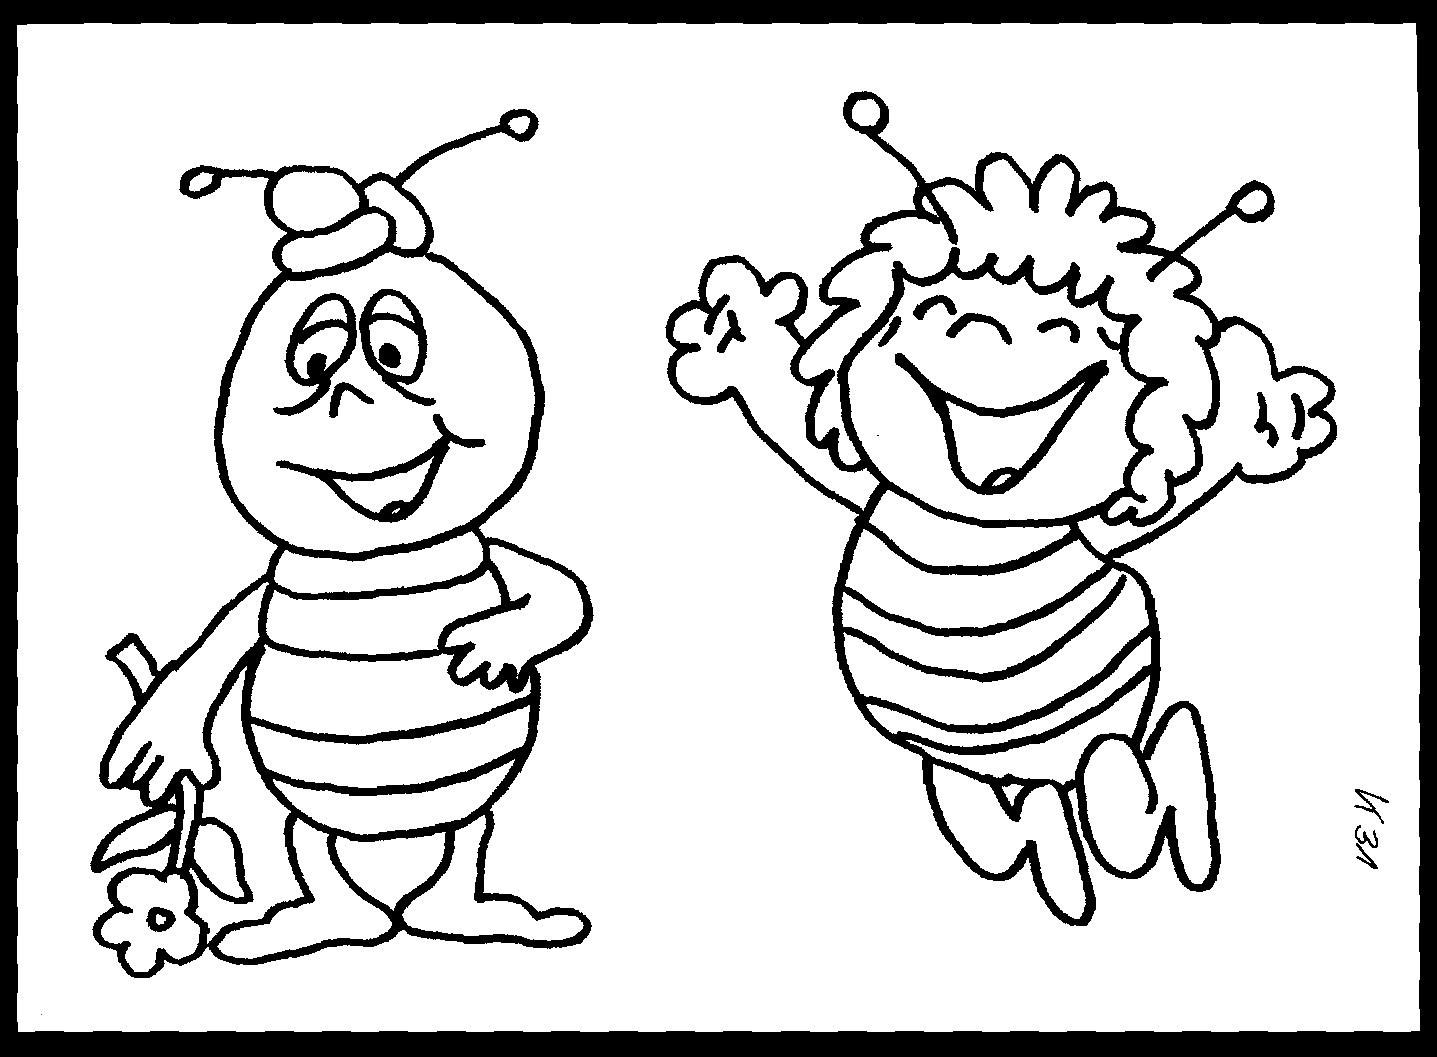 Biene Maja Ausmalbild Neu Ausmalbilder Biene Maja Schön Malvorlagen Igel Einzigartig Igel Bild